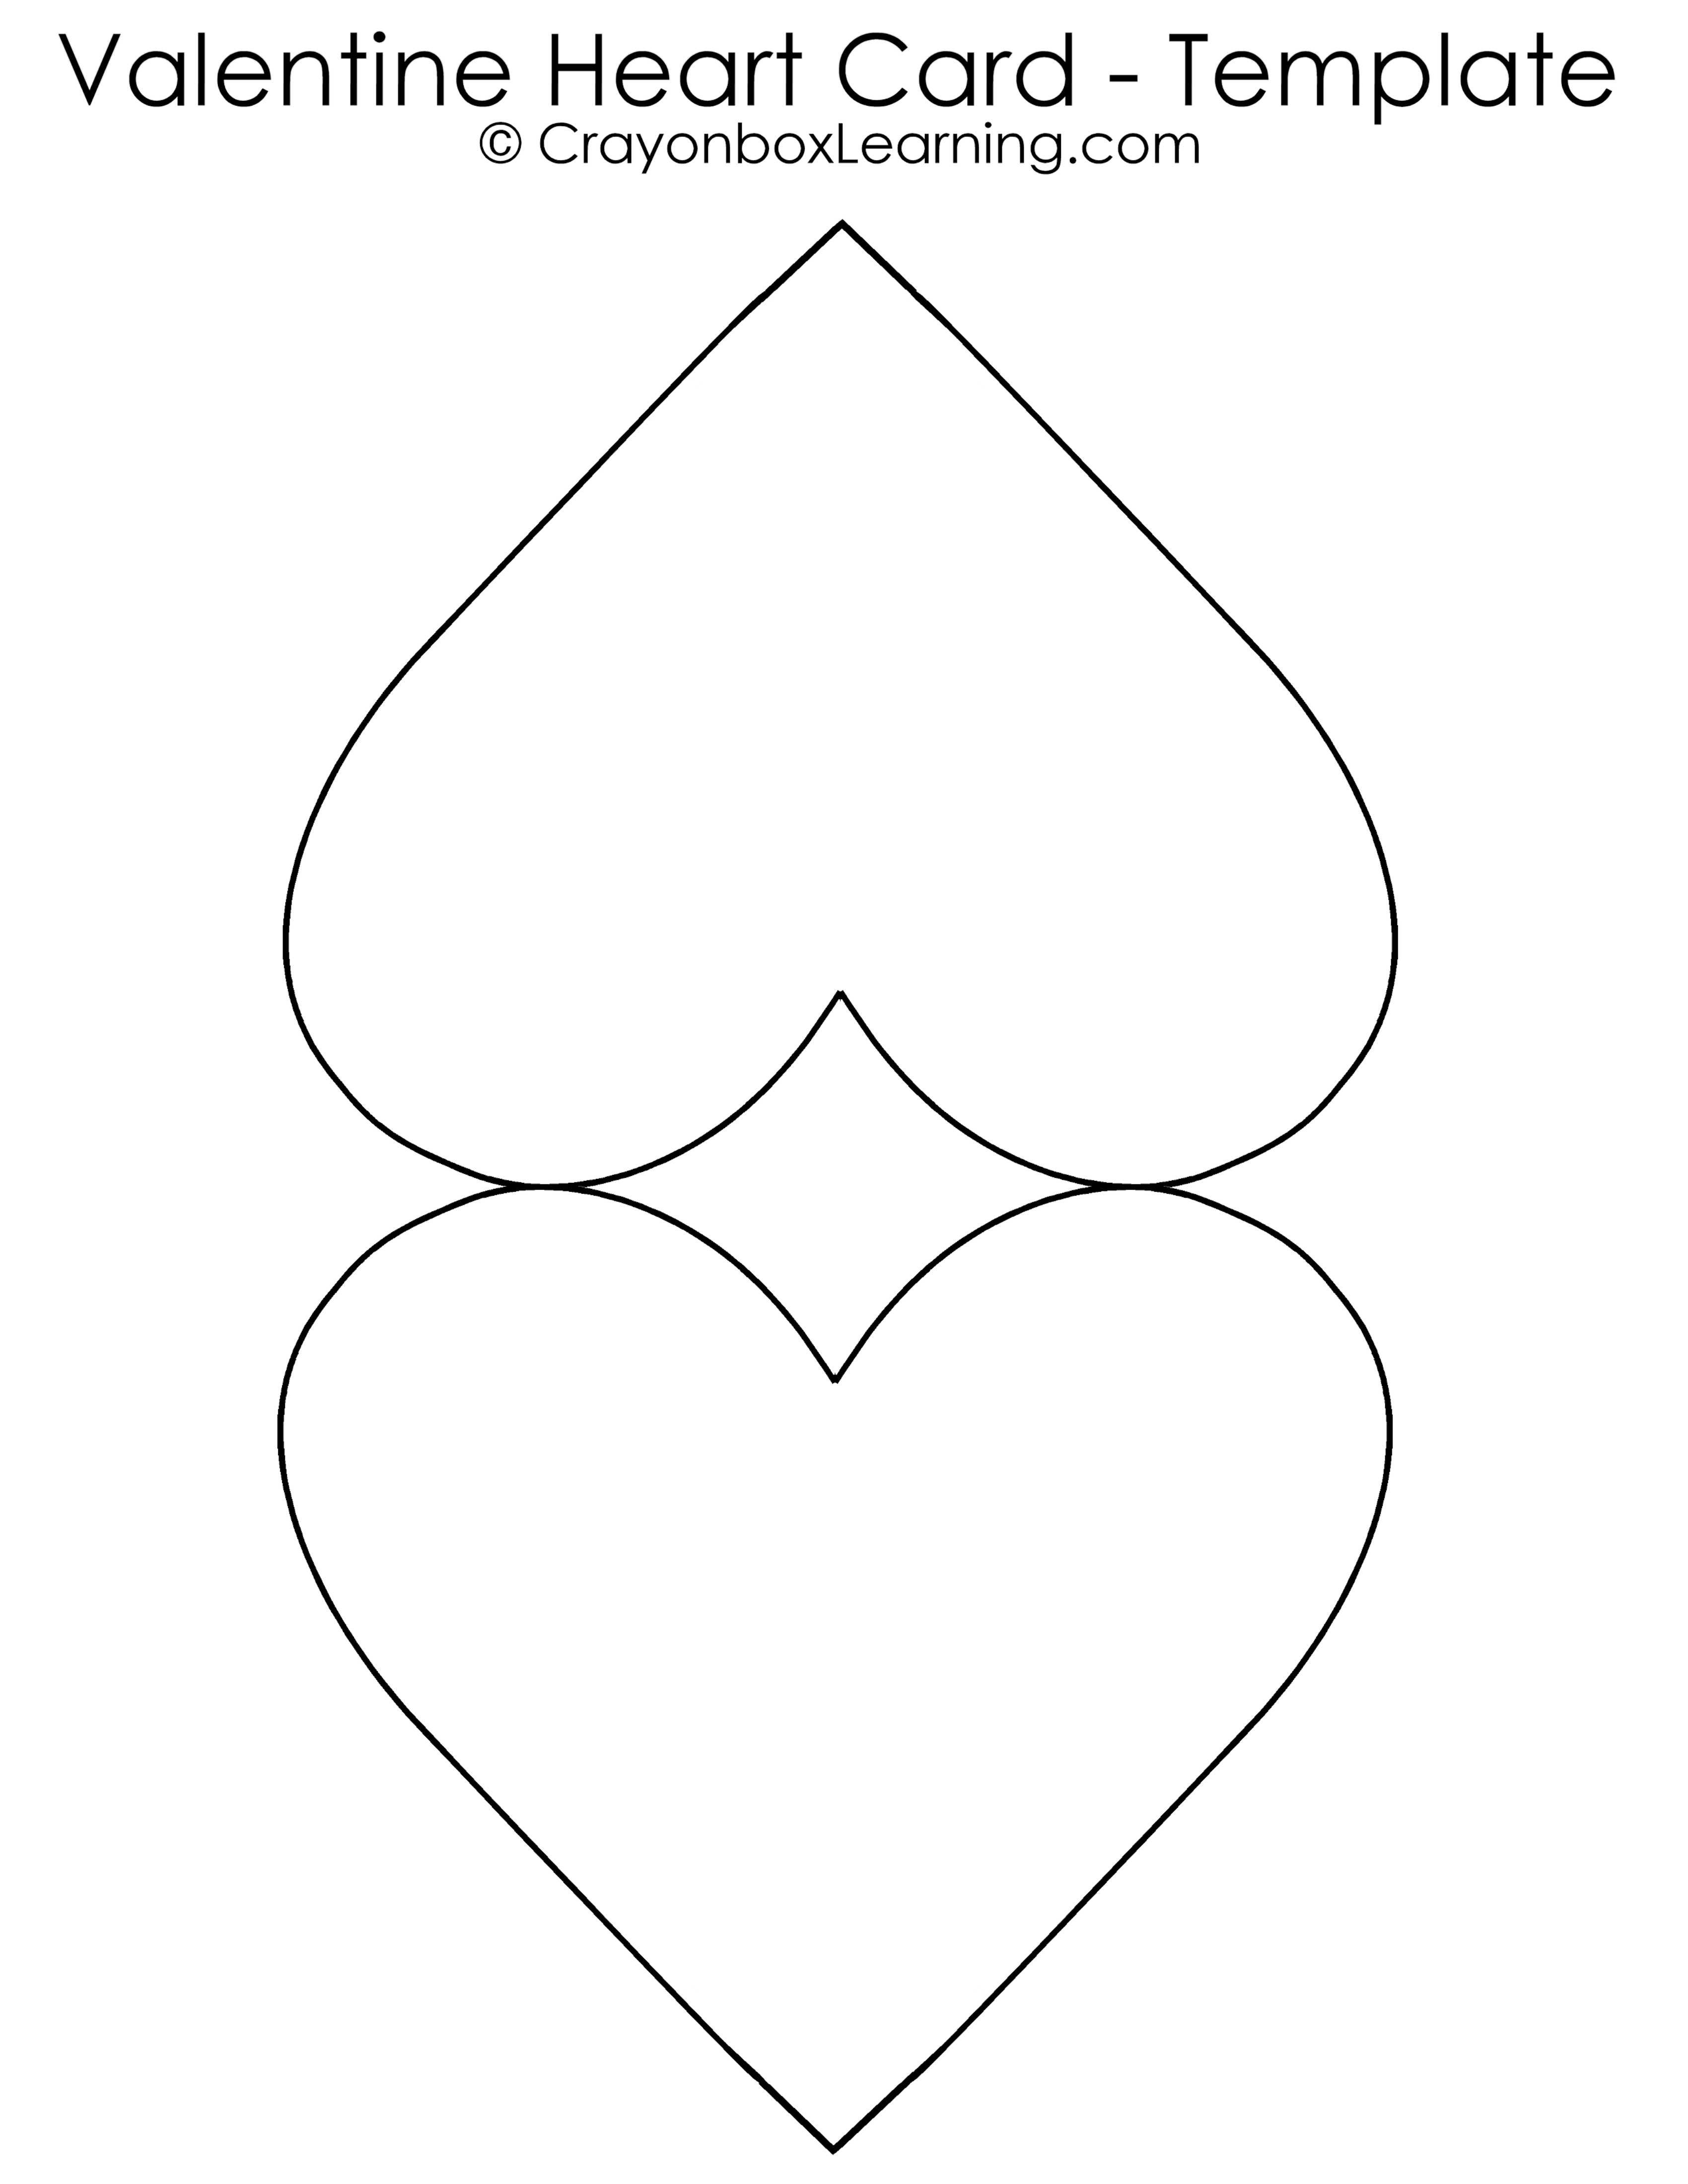 Origami Printable Templates